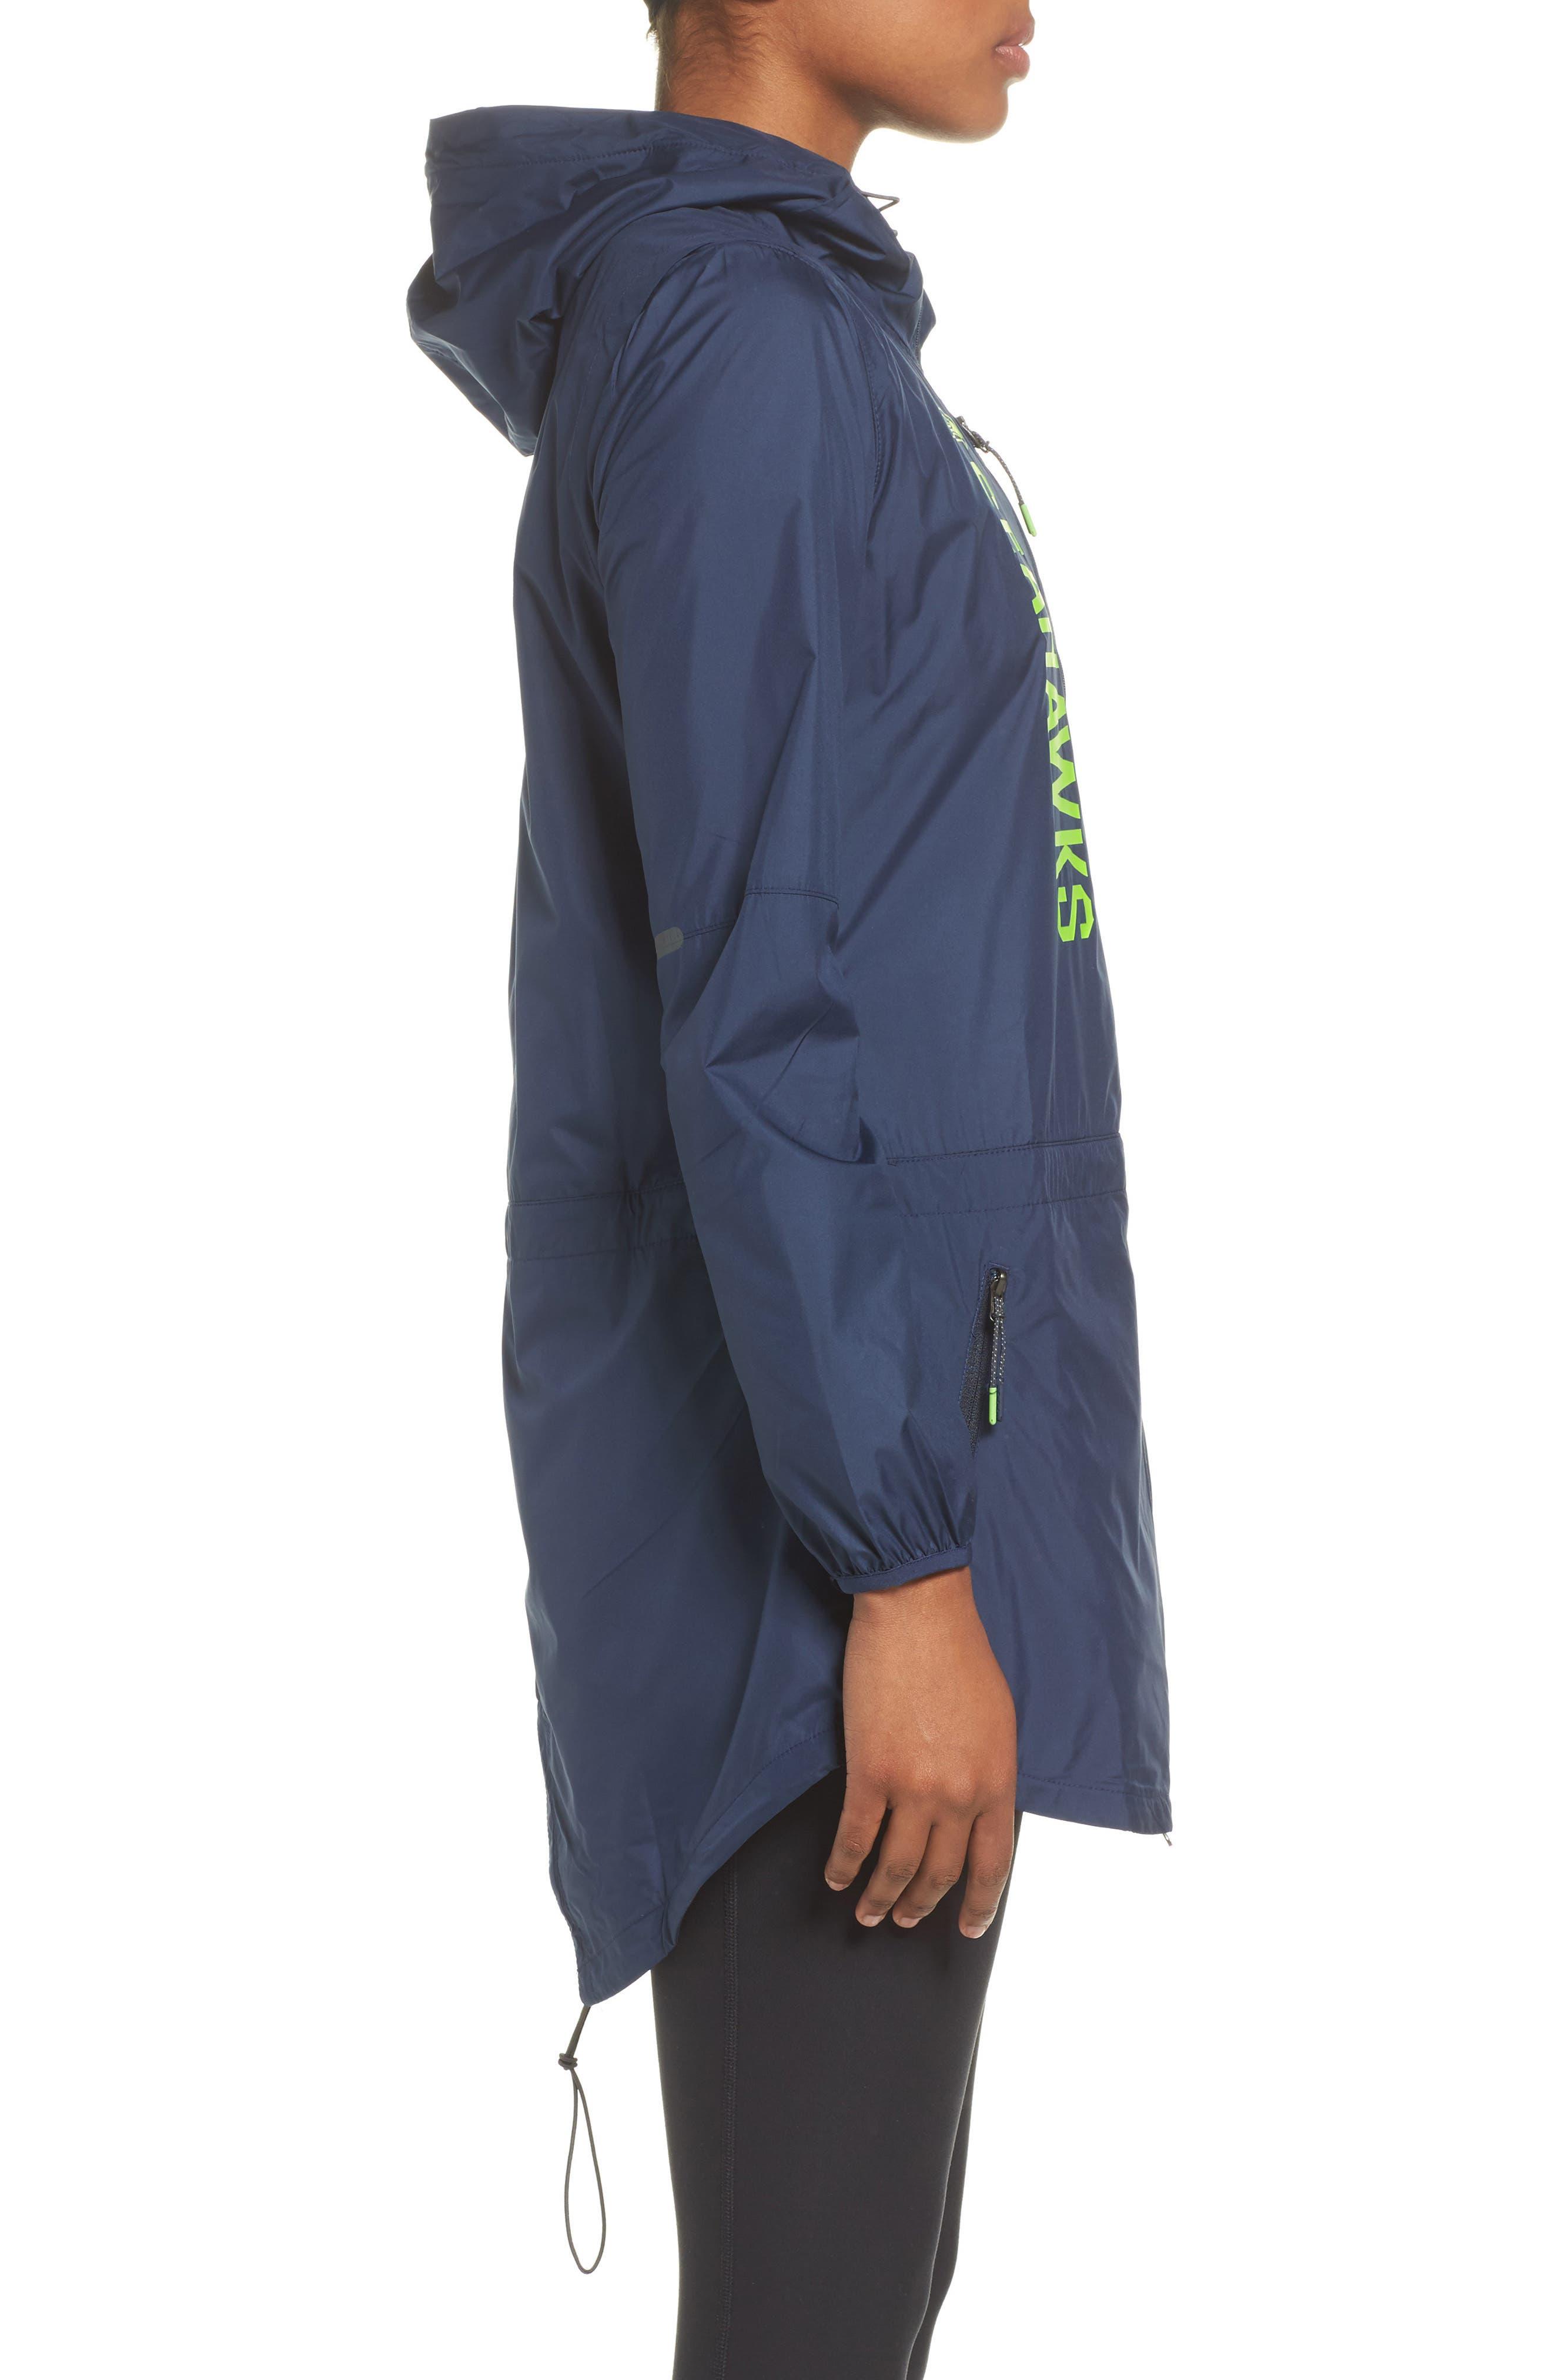 NFL Packable Water Resistant Jacket,                             Alternate thumbnail 2, color,                             College Navy/ Seahawks